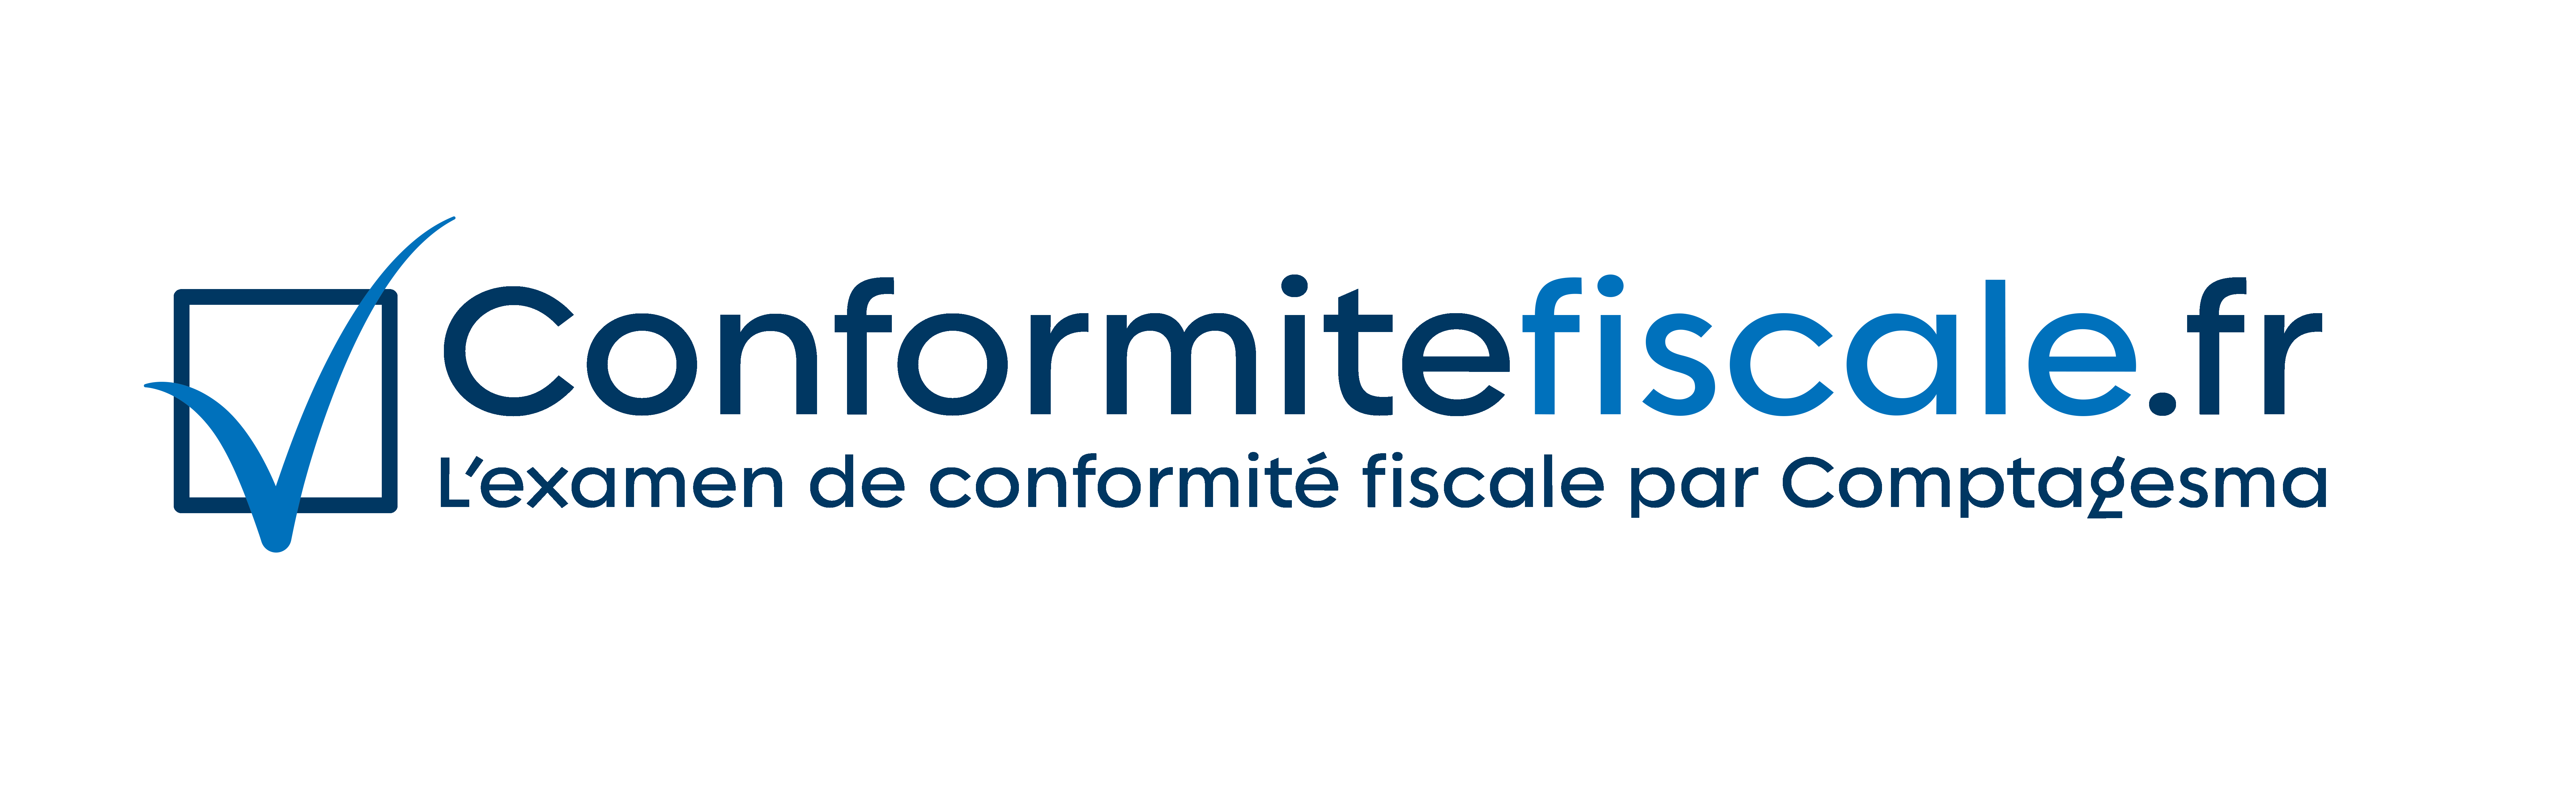 Examen de conformité fiscale